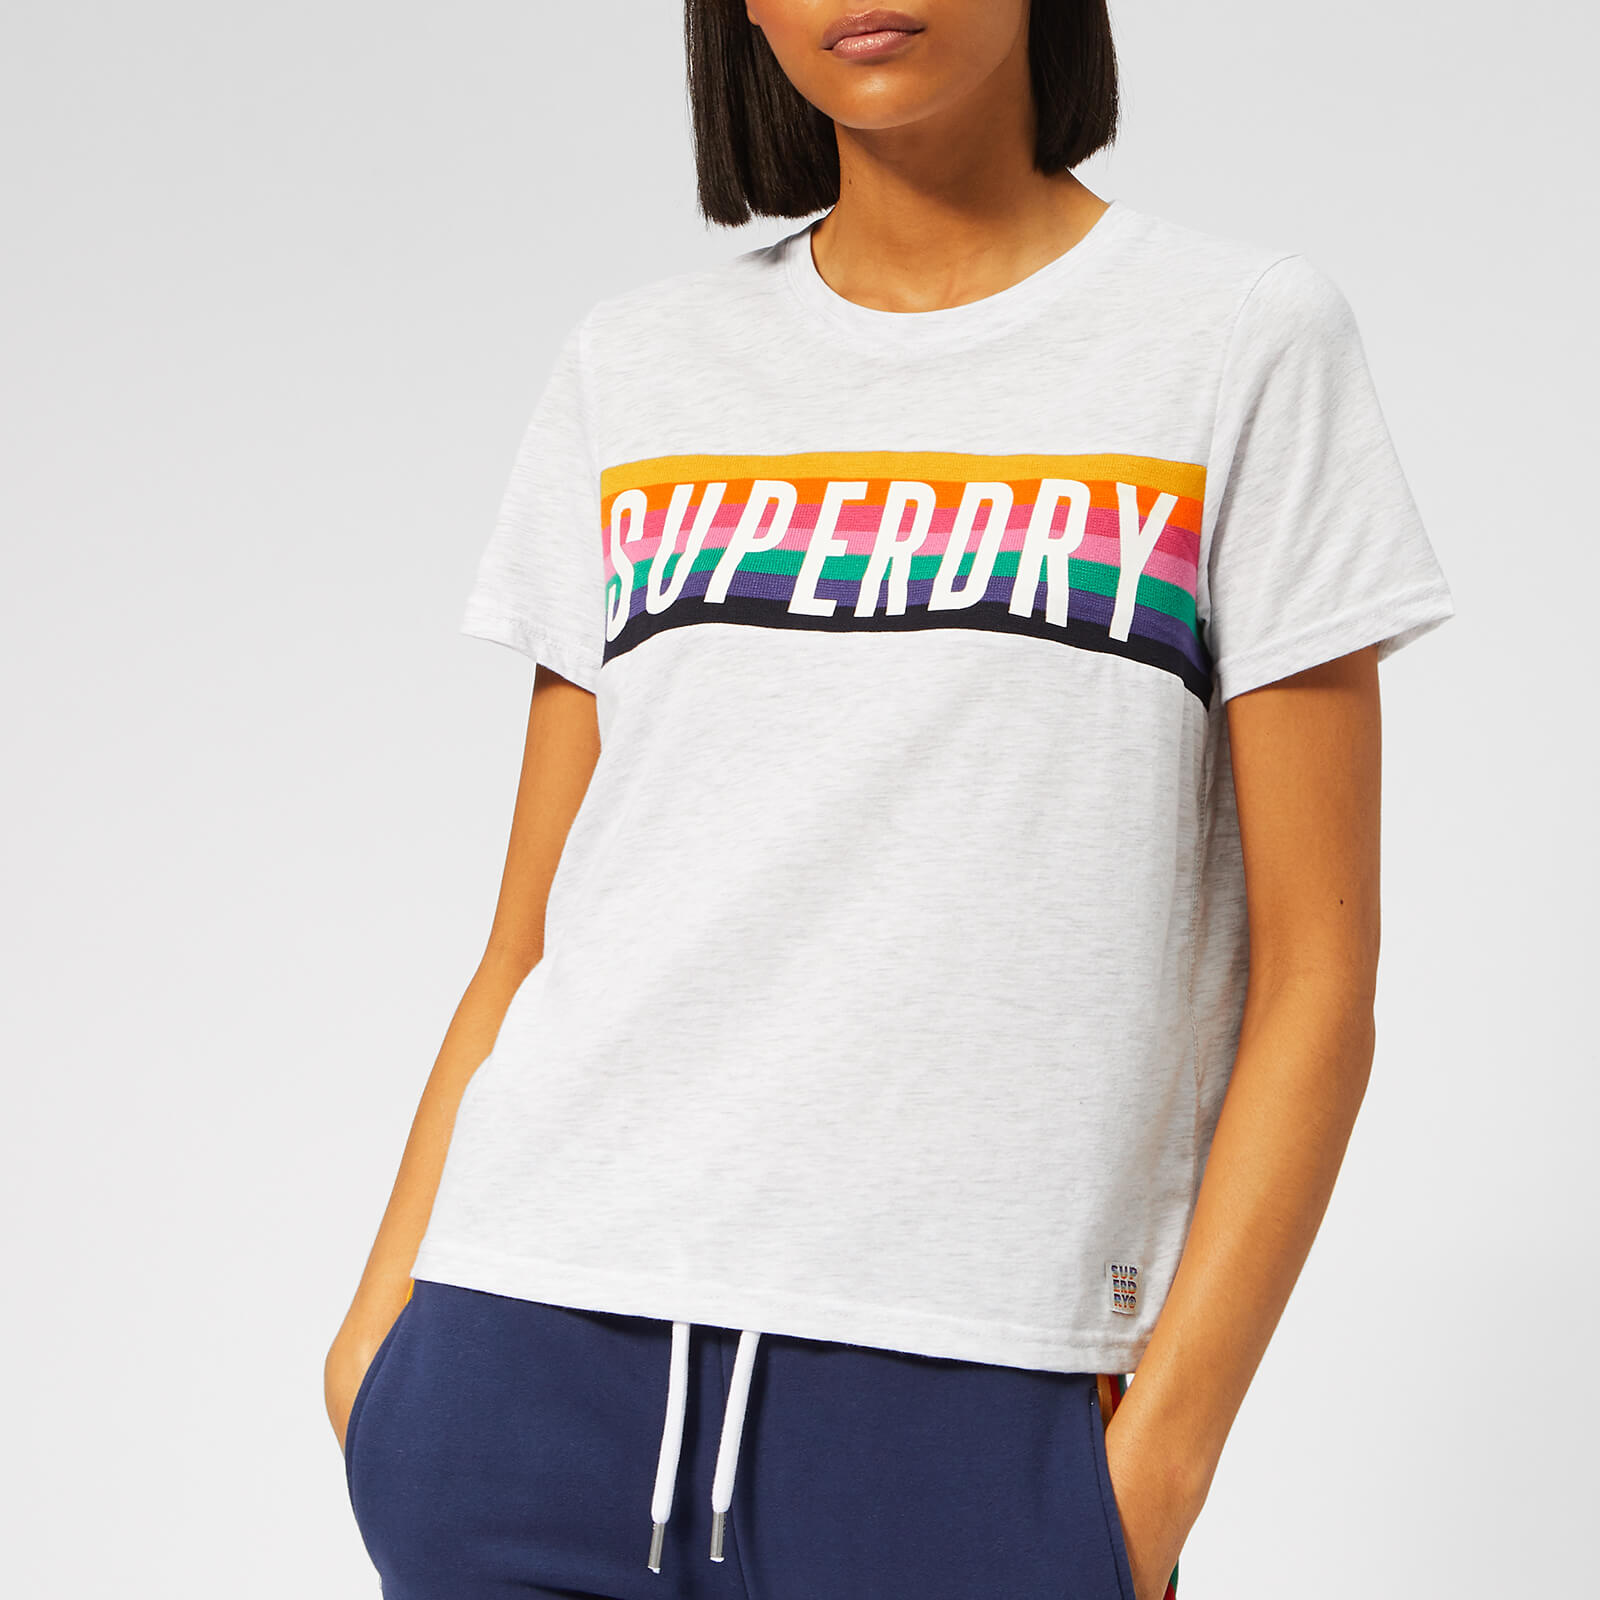 cac66ca6b Superdry Women's Rainbow Graphic T-Shirt - Ice Marl Womens Clothing |  TheHut.com